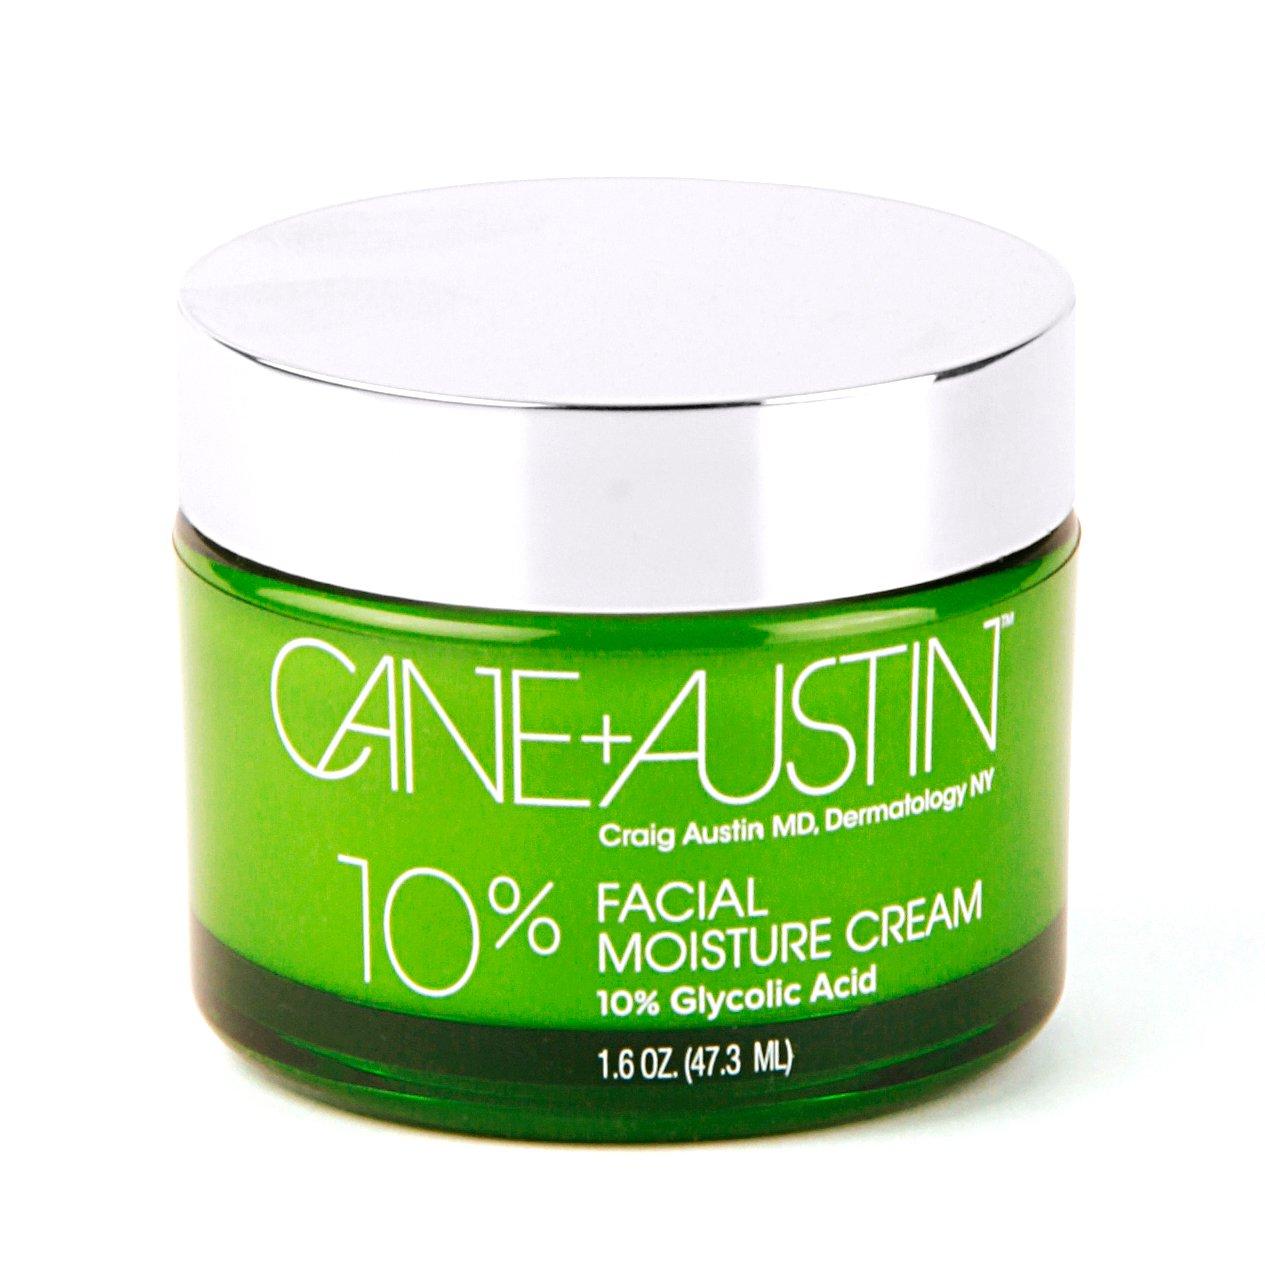 Cane & Austin Facial Moisture Cream